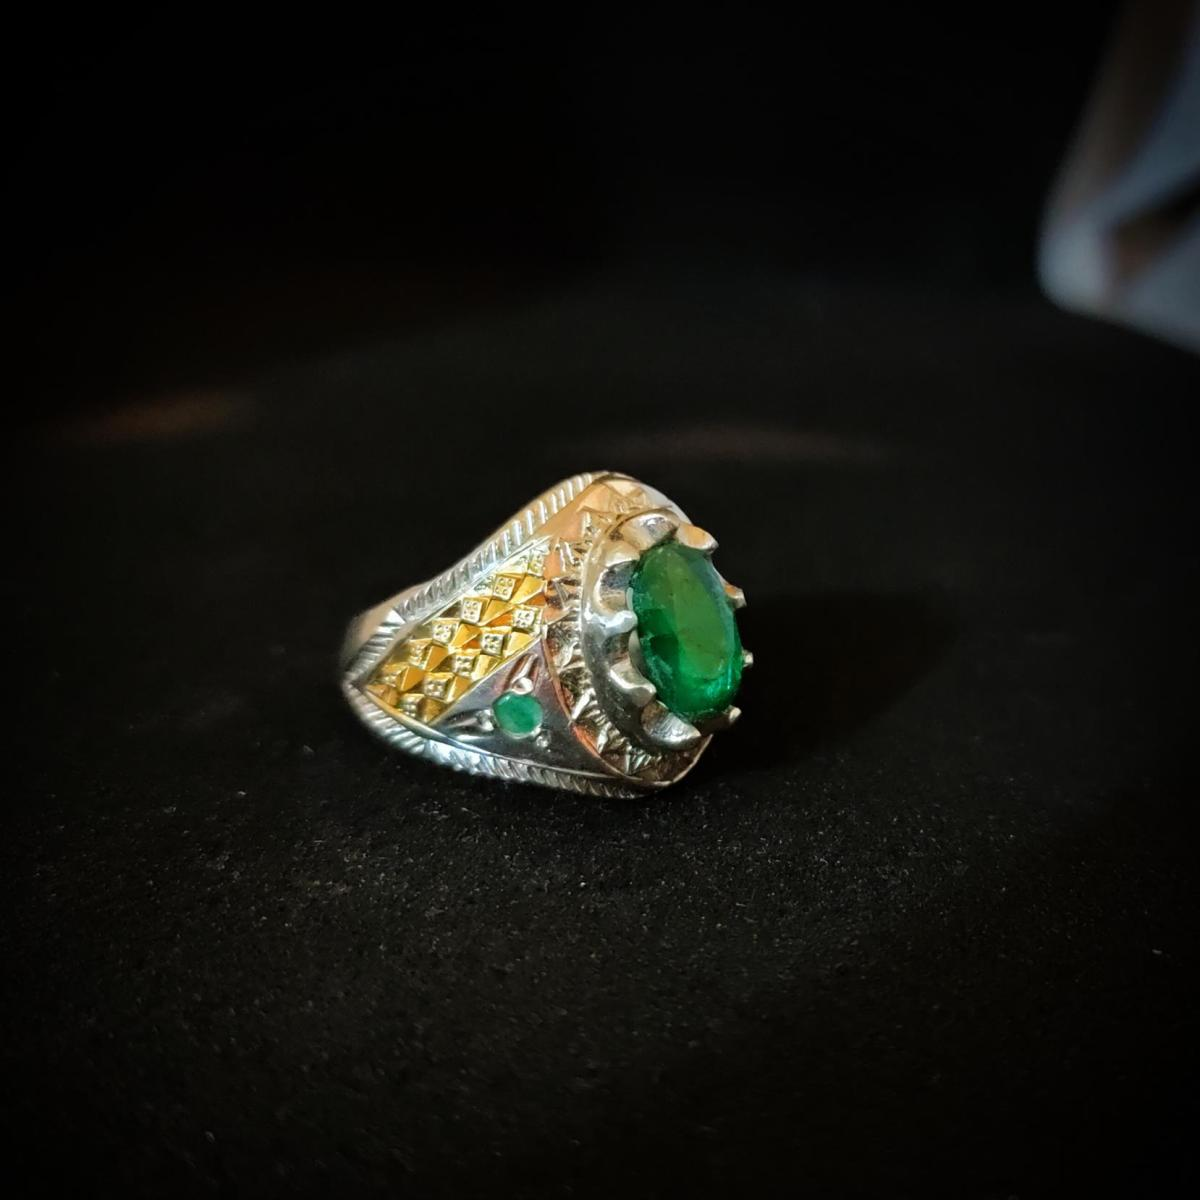 Natural Emerald Ring Handmade 925 Silver Zambian Emerald Zamurd Ring 10 natural gemstones pakistan + 925 silver jewelry online